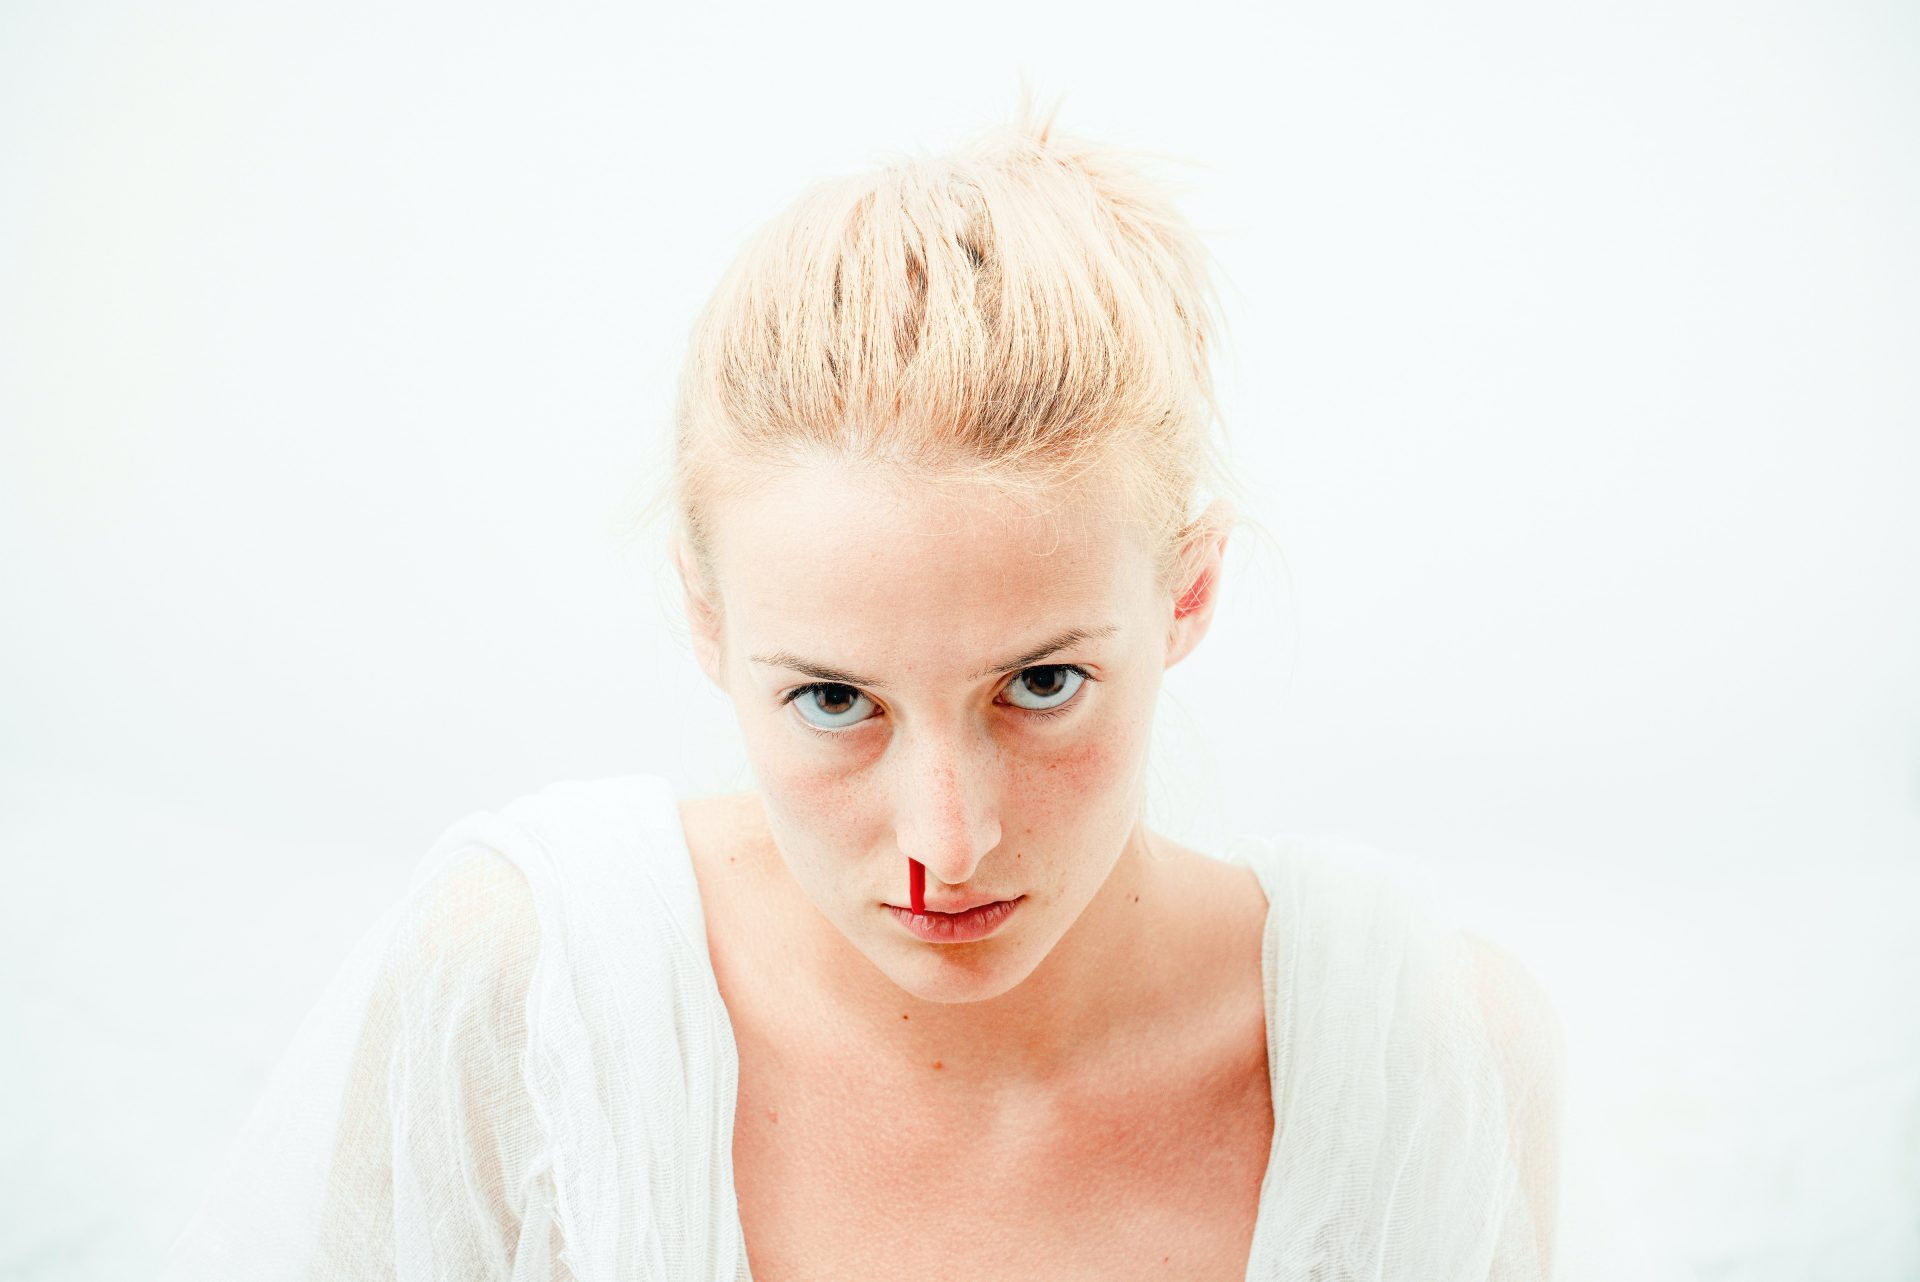 Udara Yang Terlampau Sejuk Atau Kering Punca Pendarahan Hidung, Ini Cara Rawatannya